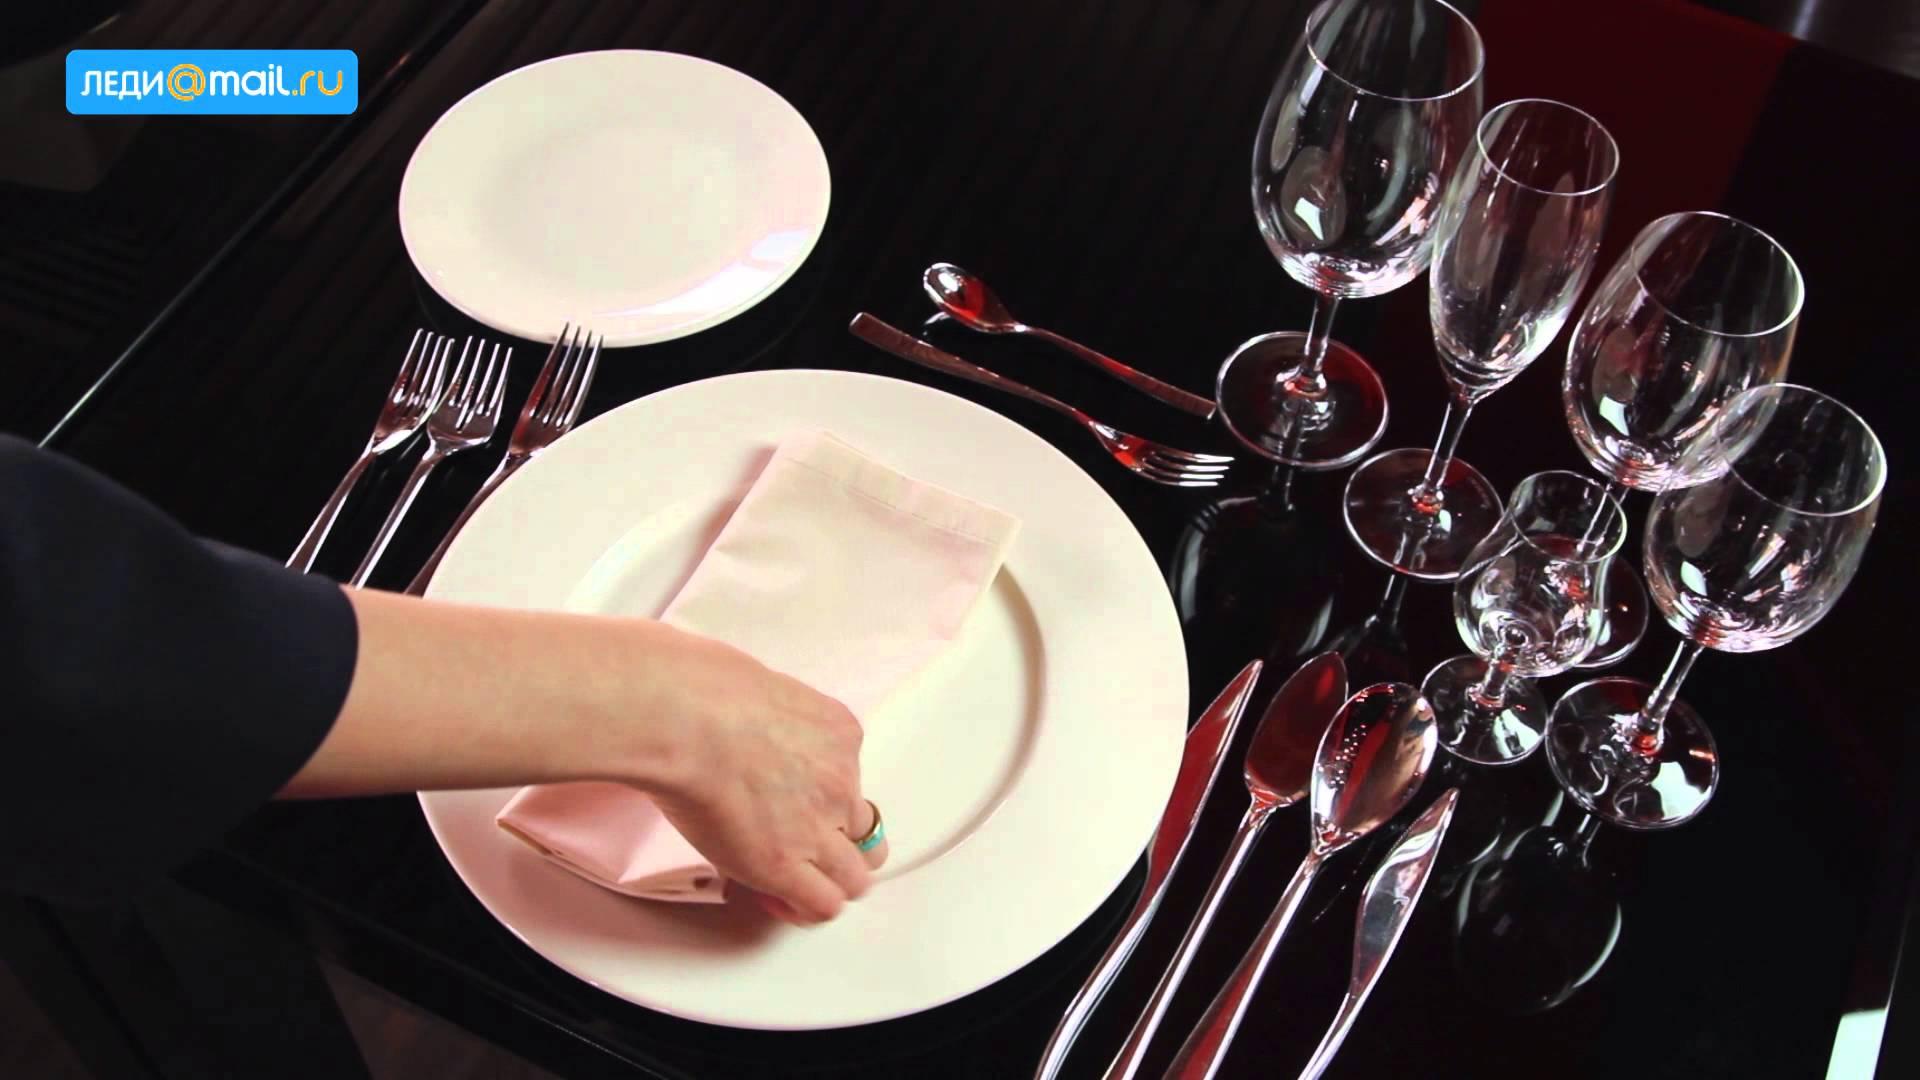 Красиво сервировать стол в домашних условиях 531